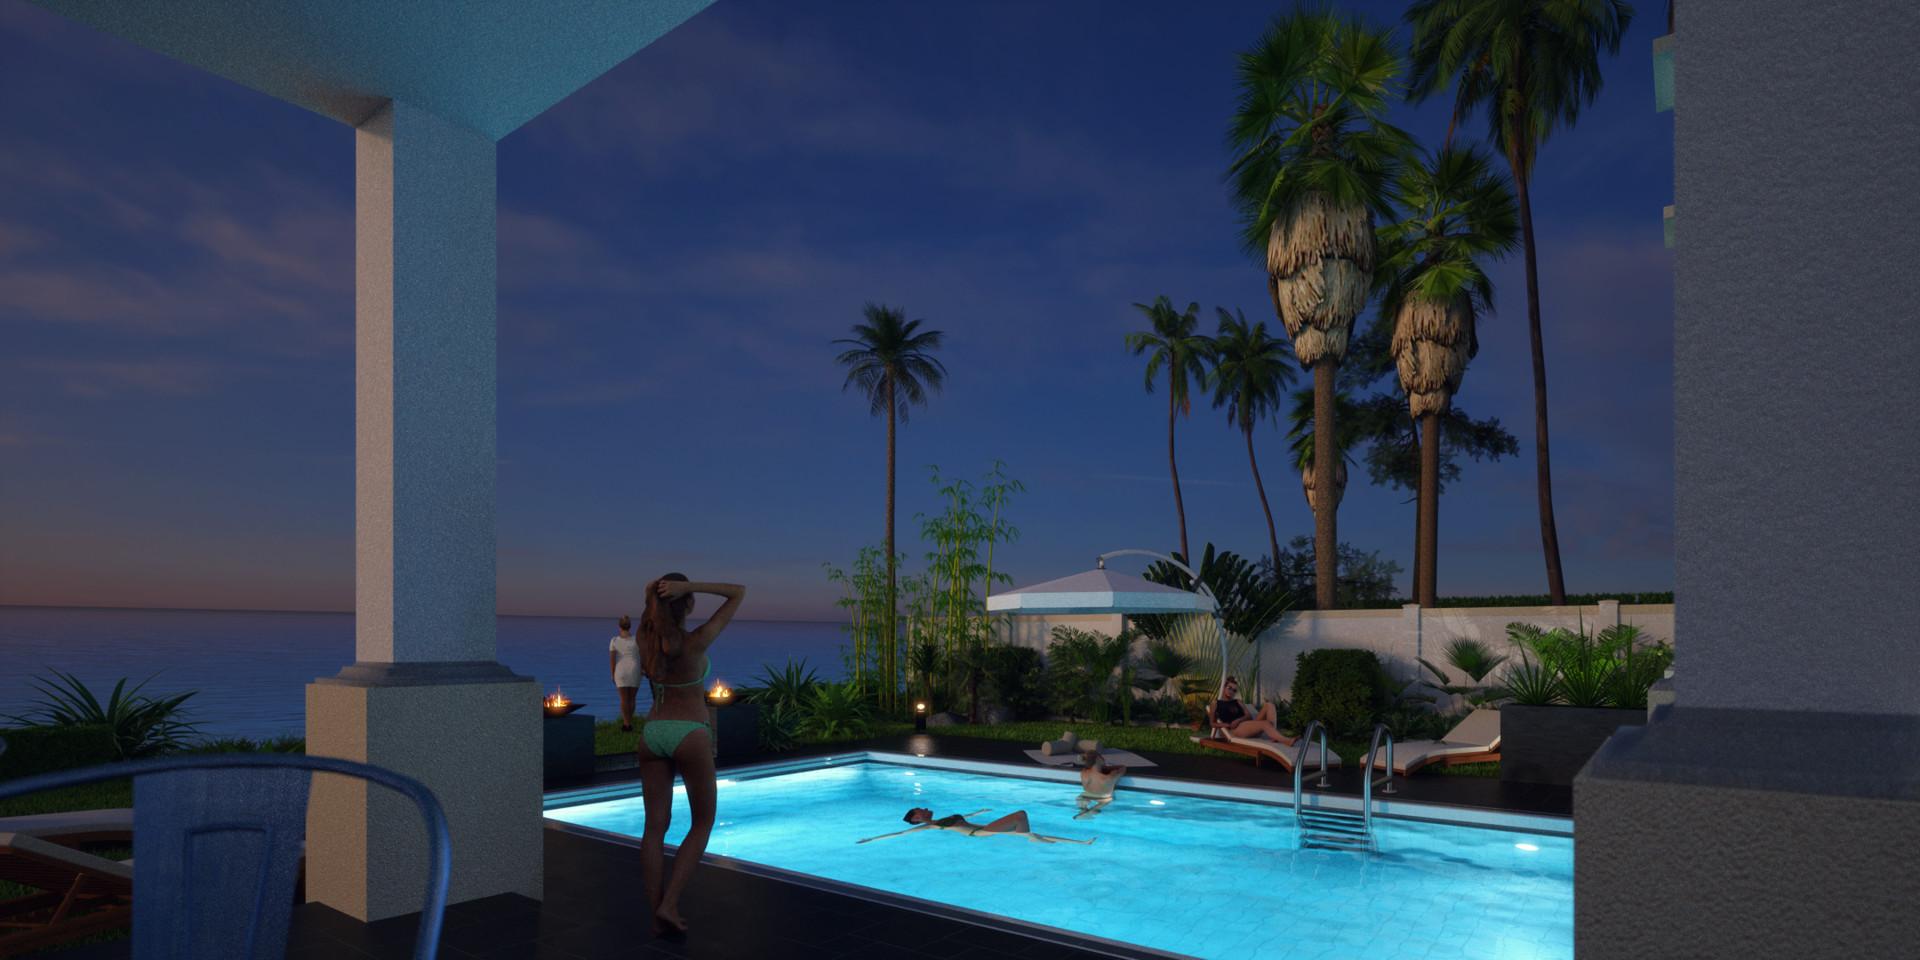 Duane kemp poolside 6b night b glare doris